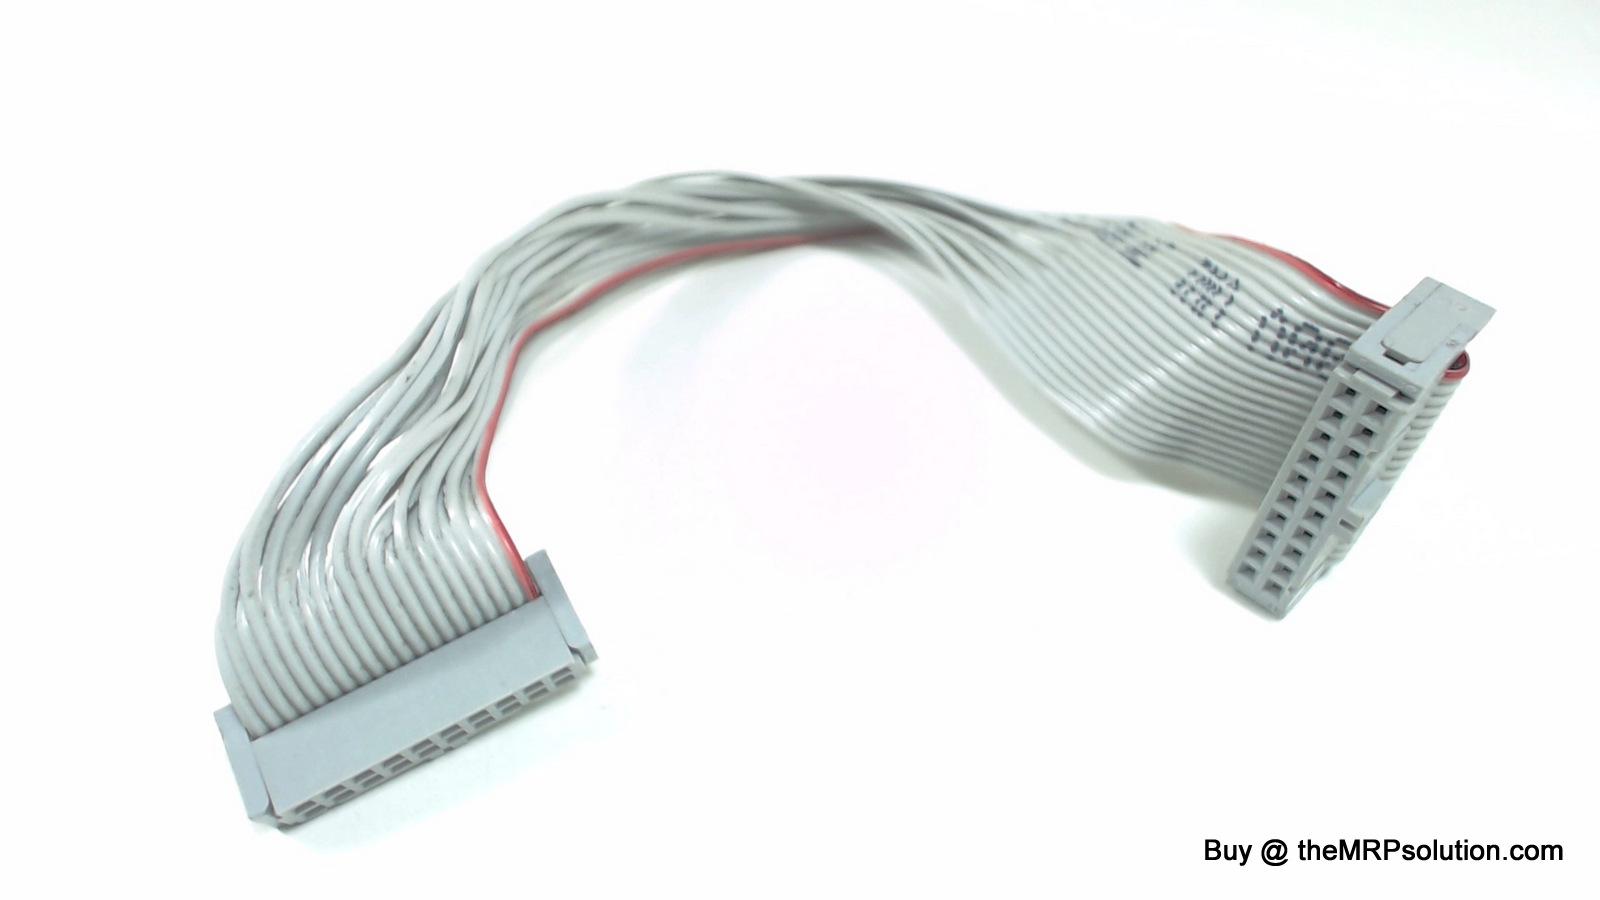 ZEBRA 46602 CABLE, PH, DATA New